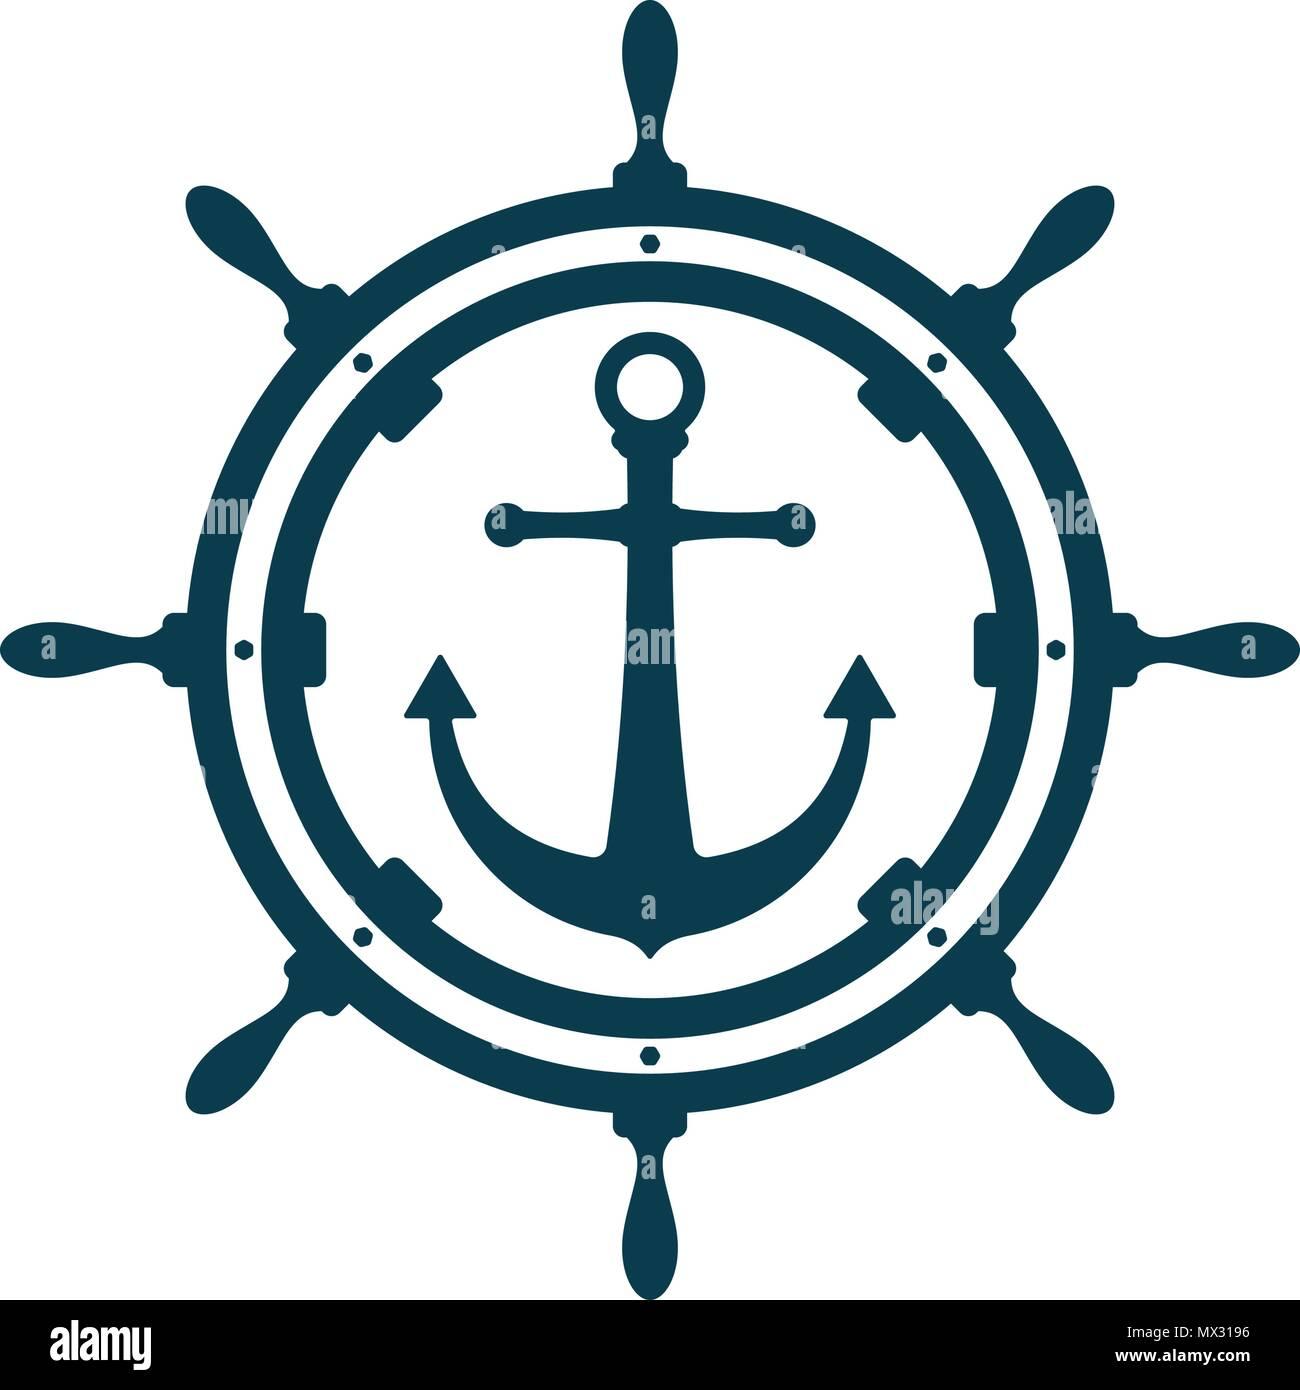 bd888546a Ship wheel and anchor on white background. Nautical icon design ...